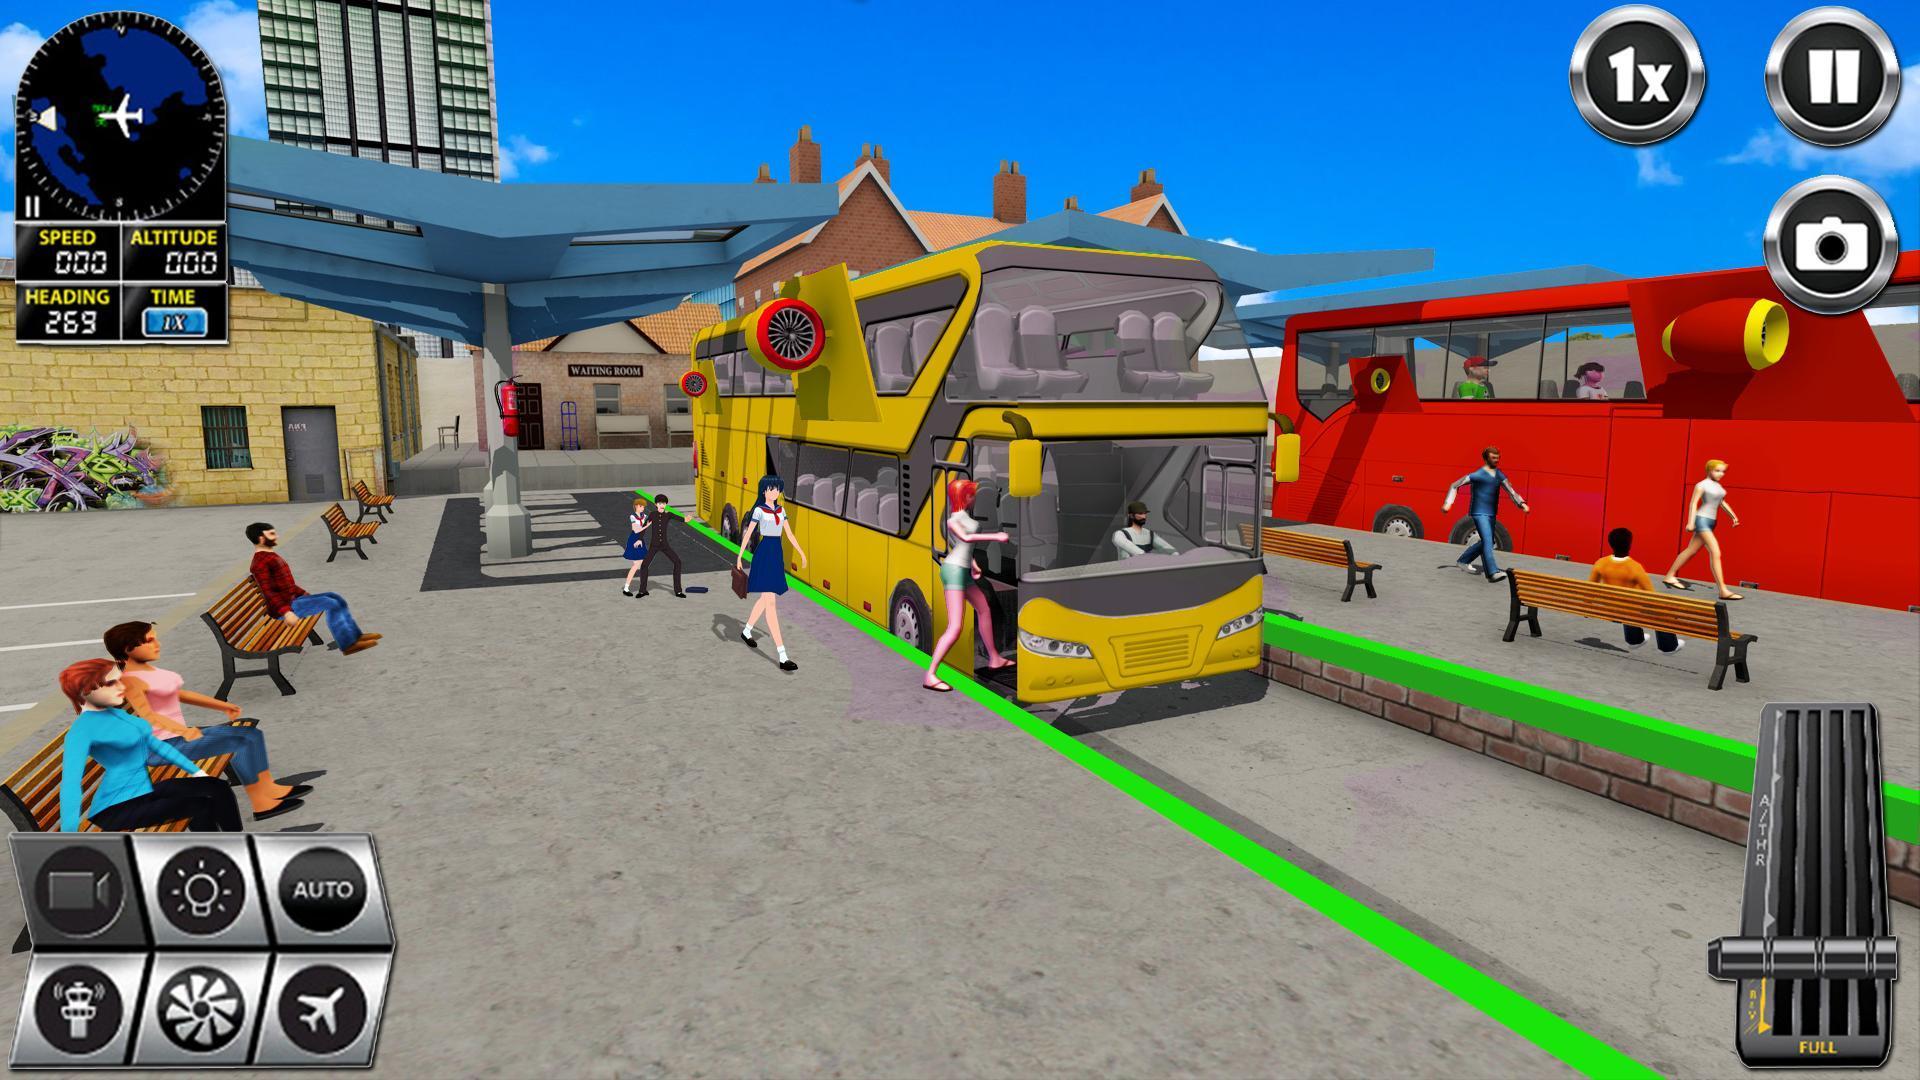 Flying Bus Driving simulator 2019: Free Bus Games 2.8 Screenshot 7